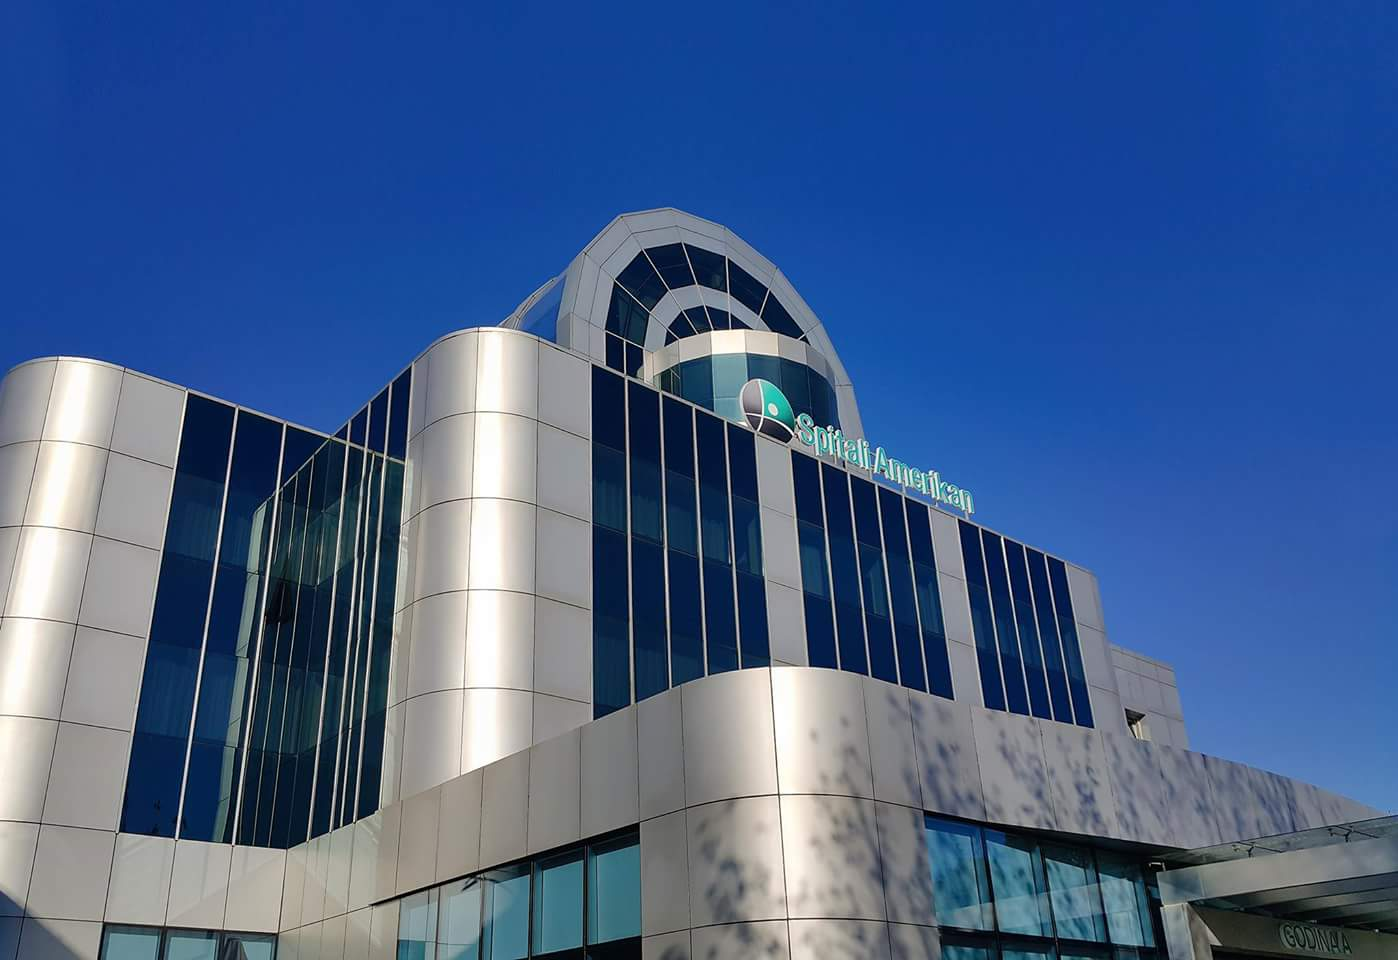 Image result for spitali amerikan